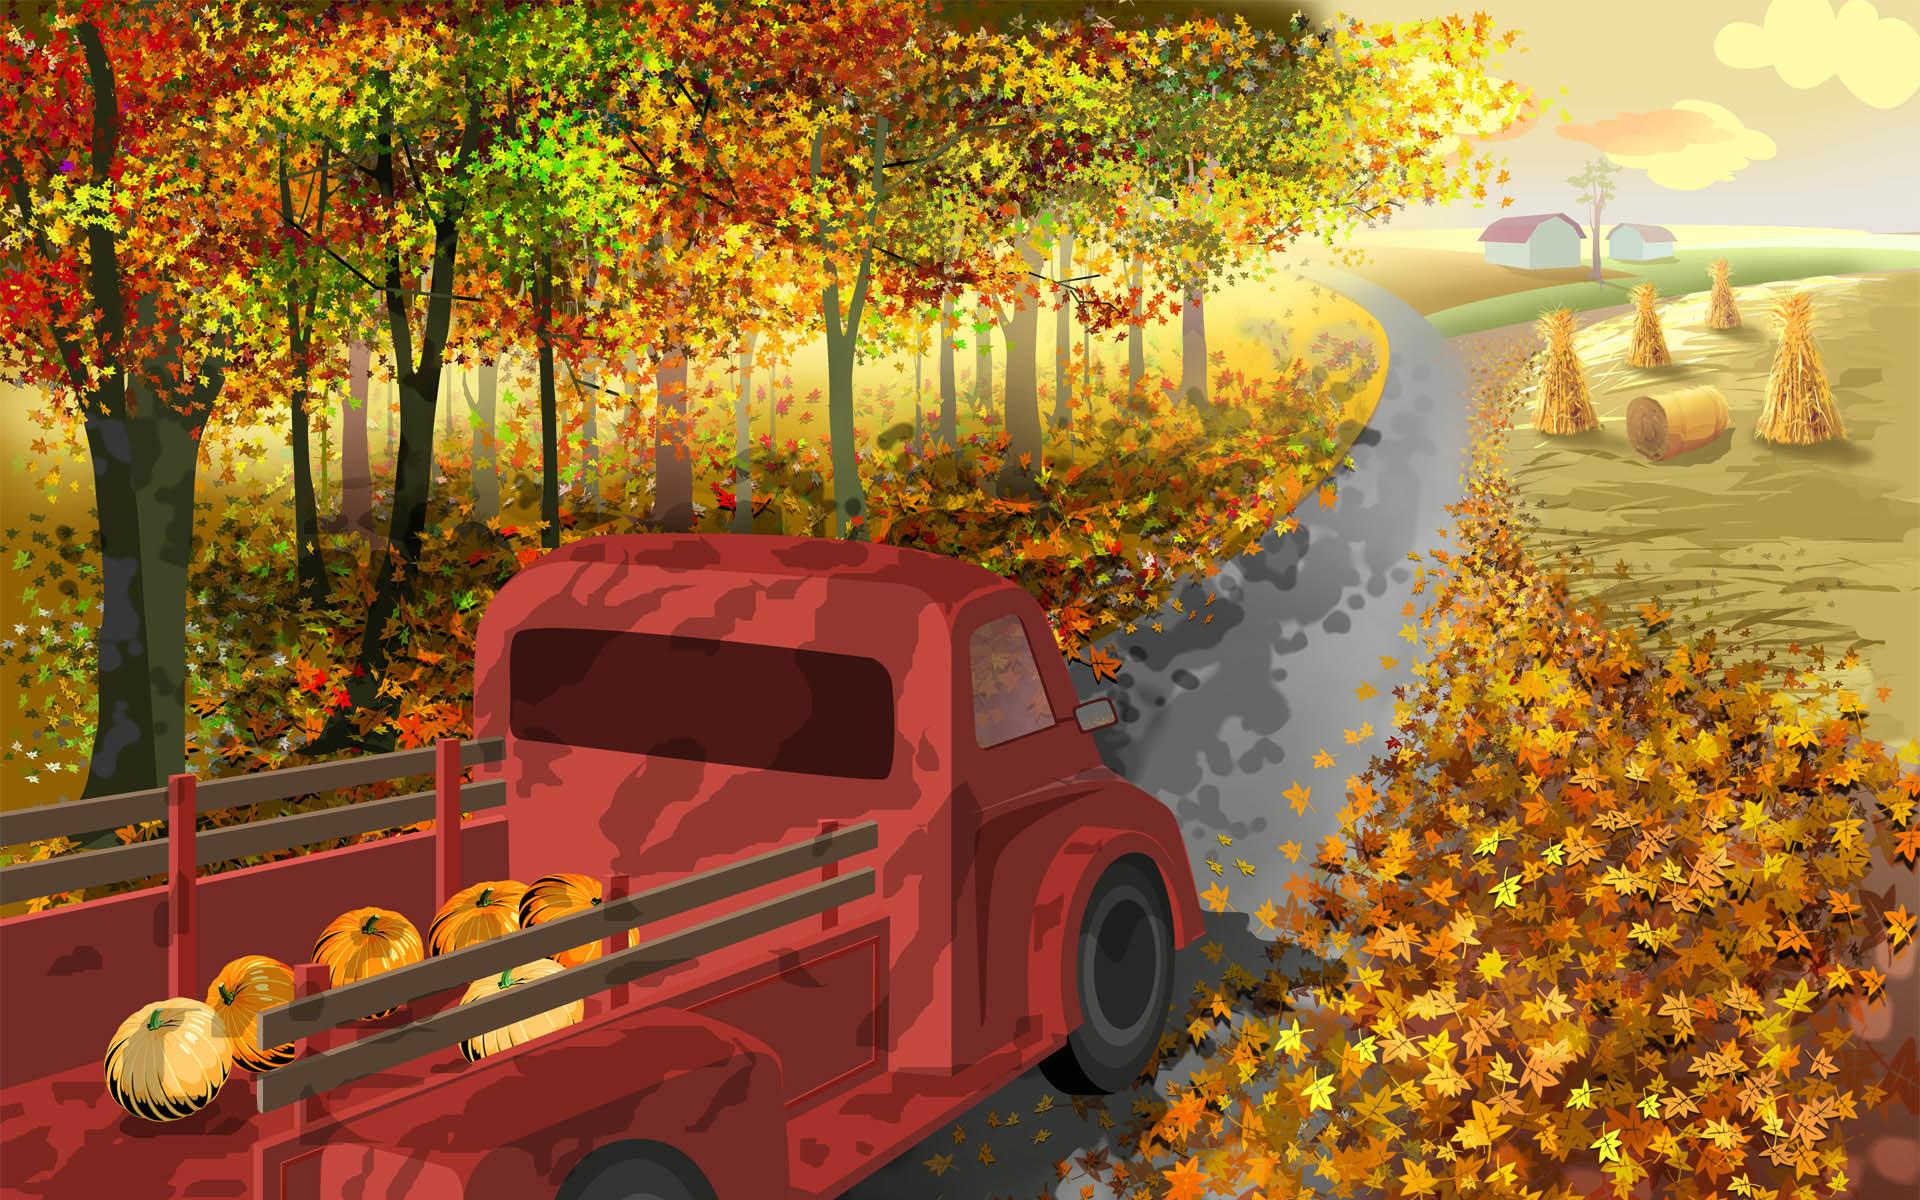 Thanksgiving Cartoon,Thanksgiving Desktop Wallpaper 7_High Definition .